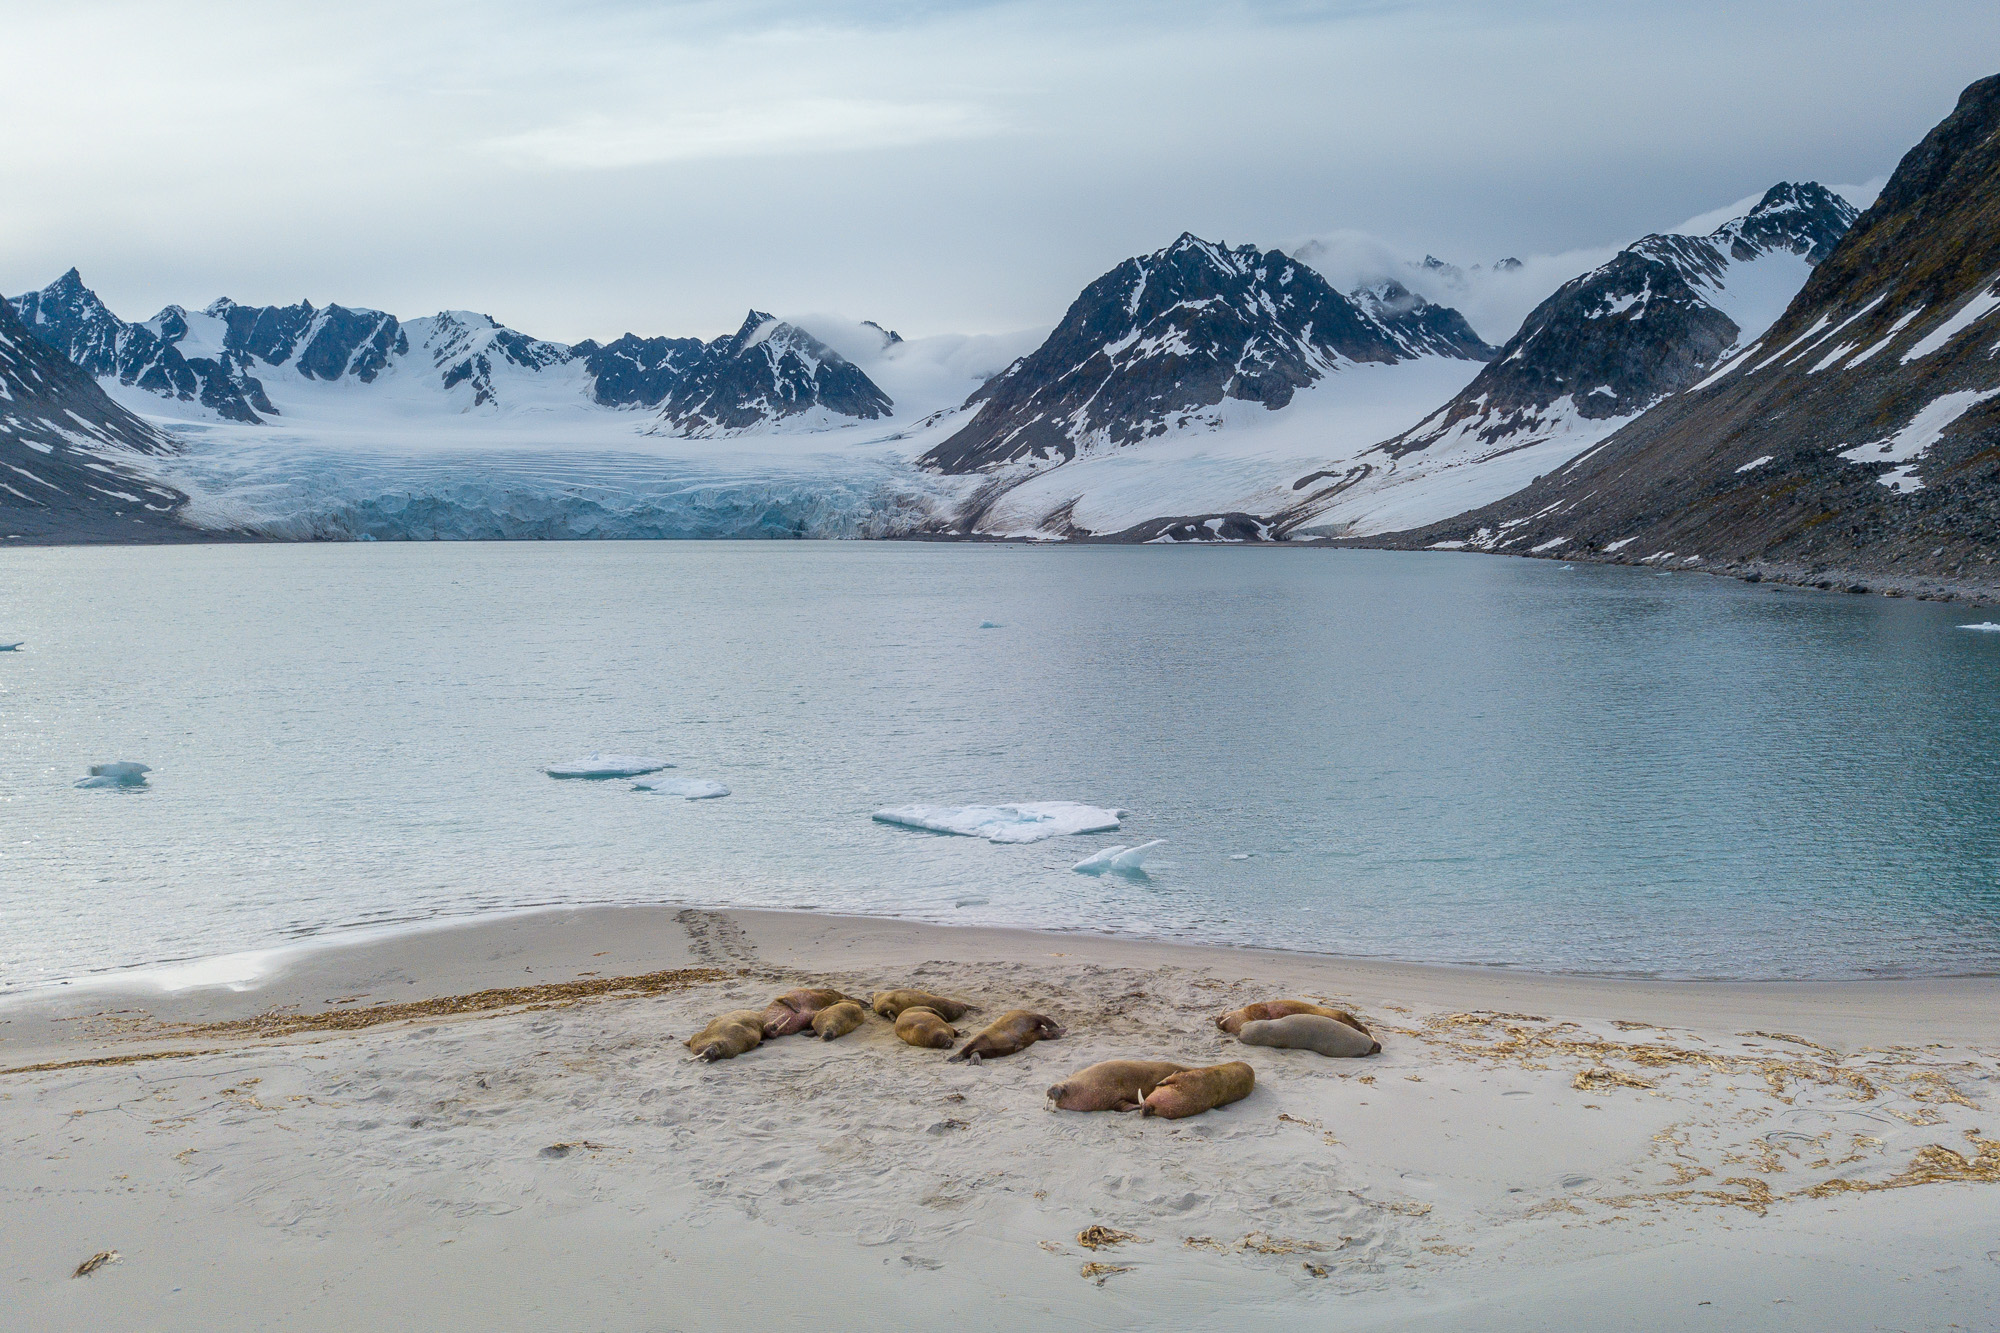 Vancoillie - Spitsbergen - 2018-07-04DJI_0059.jpg